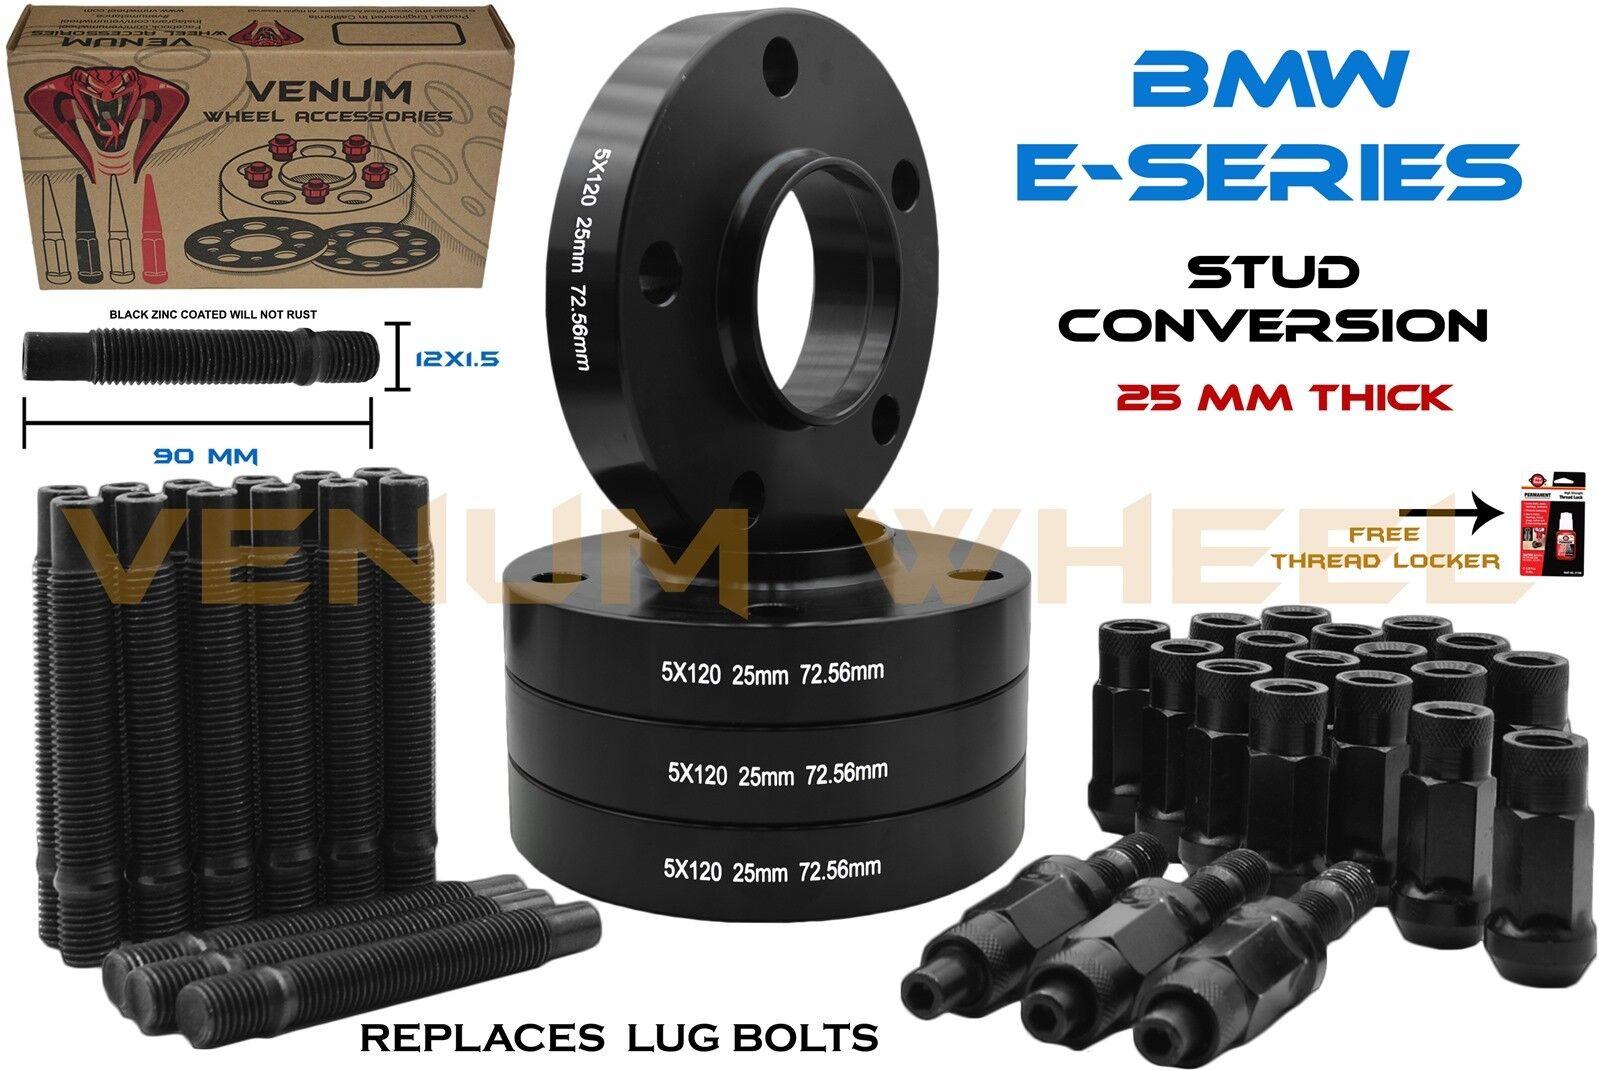 25 fit BMW M3 E36 E46 20 Wheel Stud Conversion kit Chrome Open Nuts 90mm